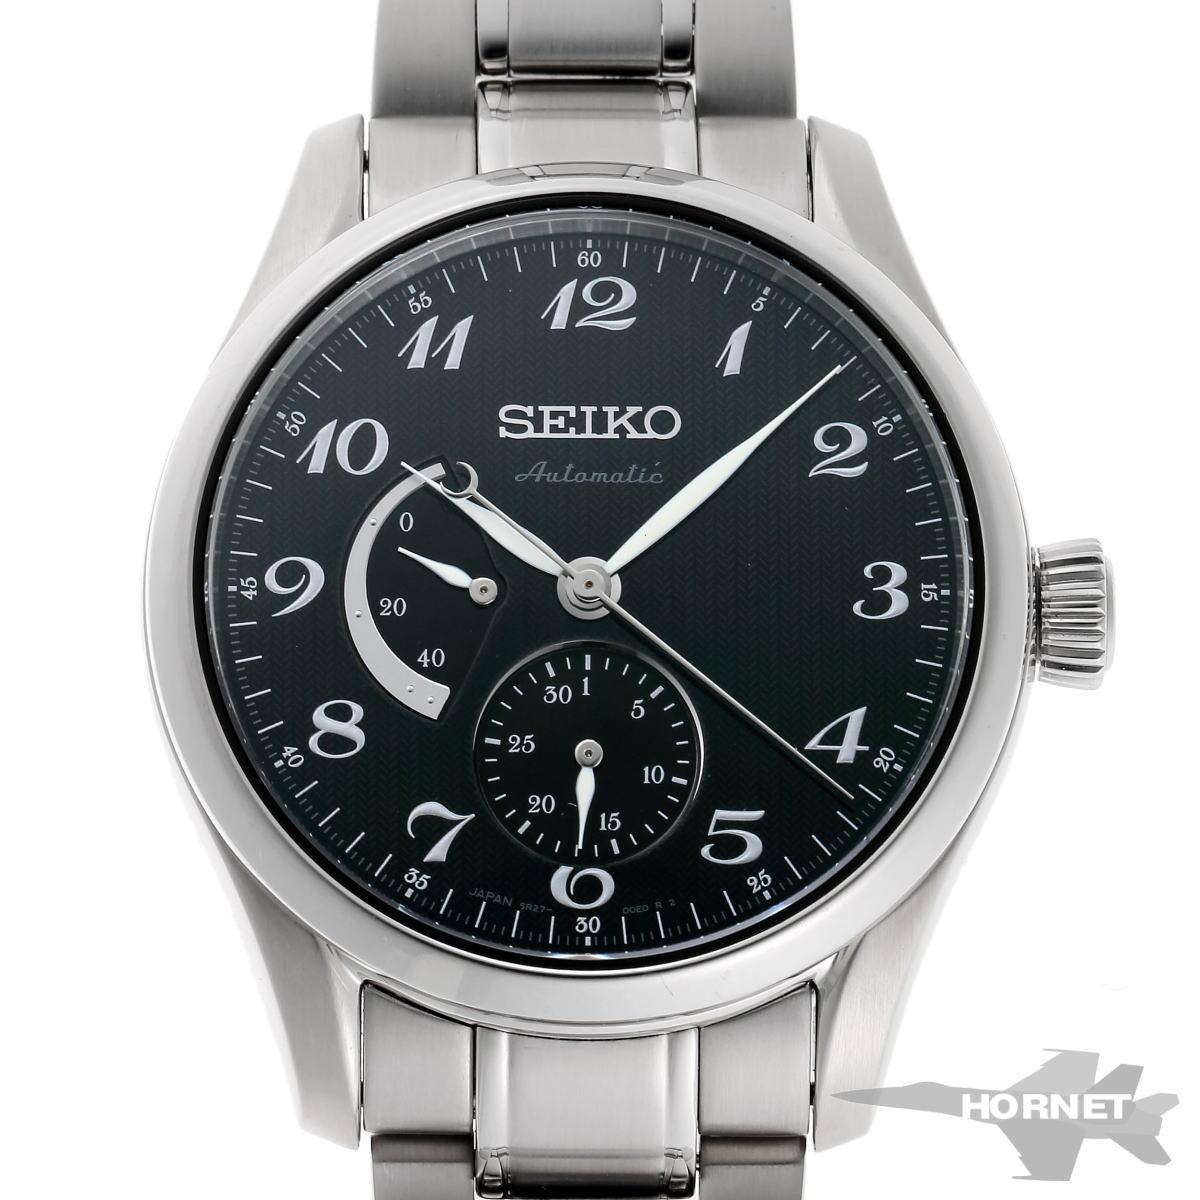 SEIKO セイコー プレザージュ オートマチック SARW029 6R27-00J0 ブラック文字盤 SS 【中古】【時計】 1910313